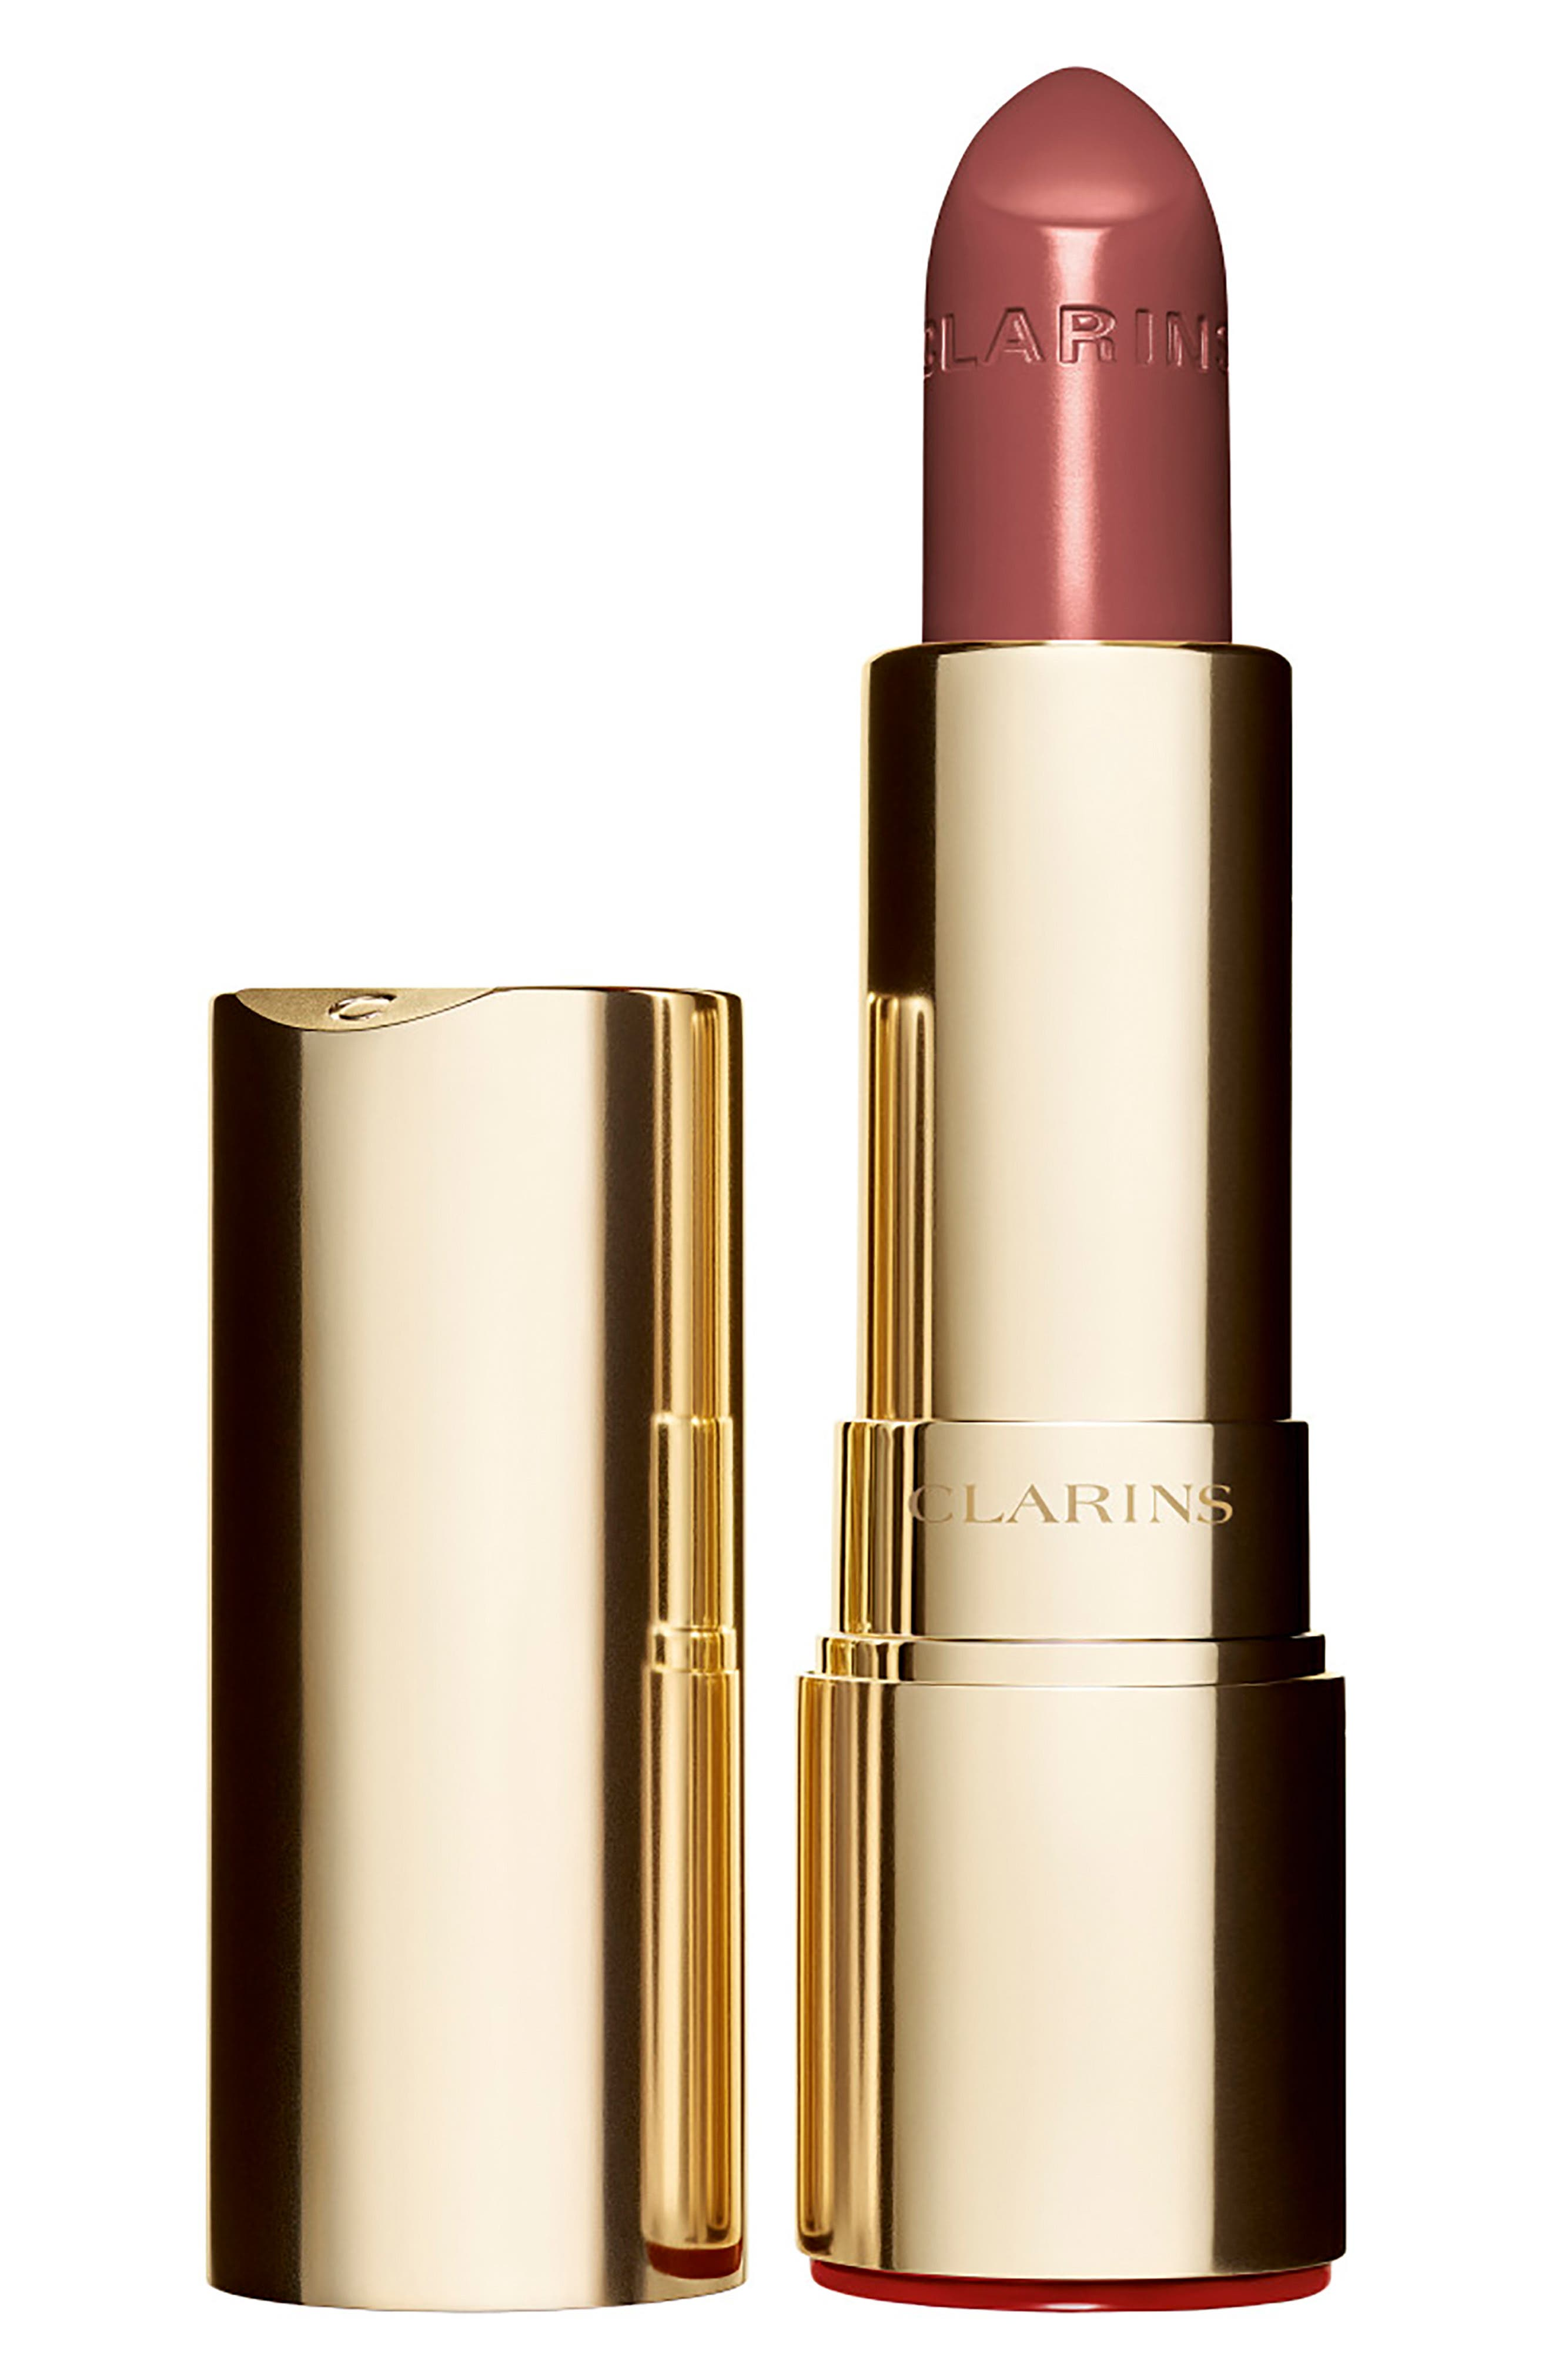 CLARINS, Joli Rouge Lipstick, Main thumbnail 1, color, 757 NUDE BRICK